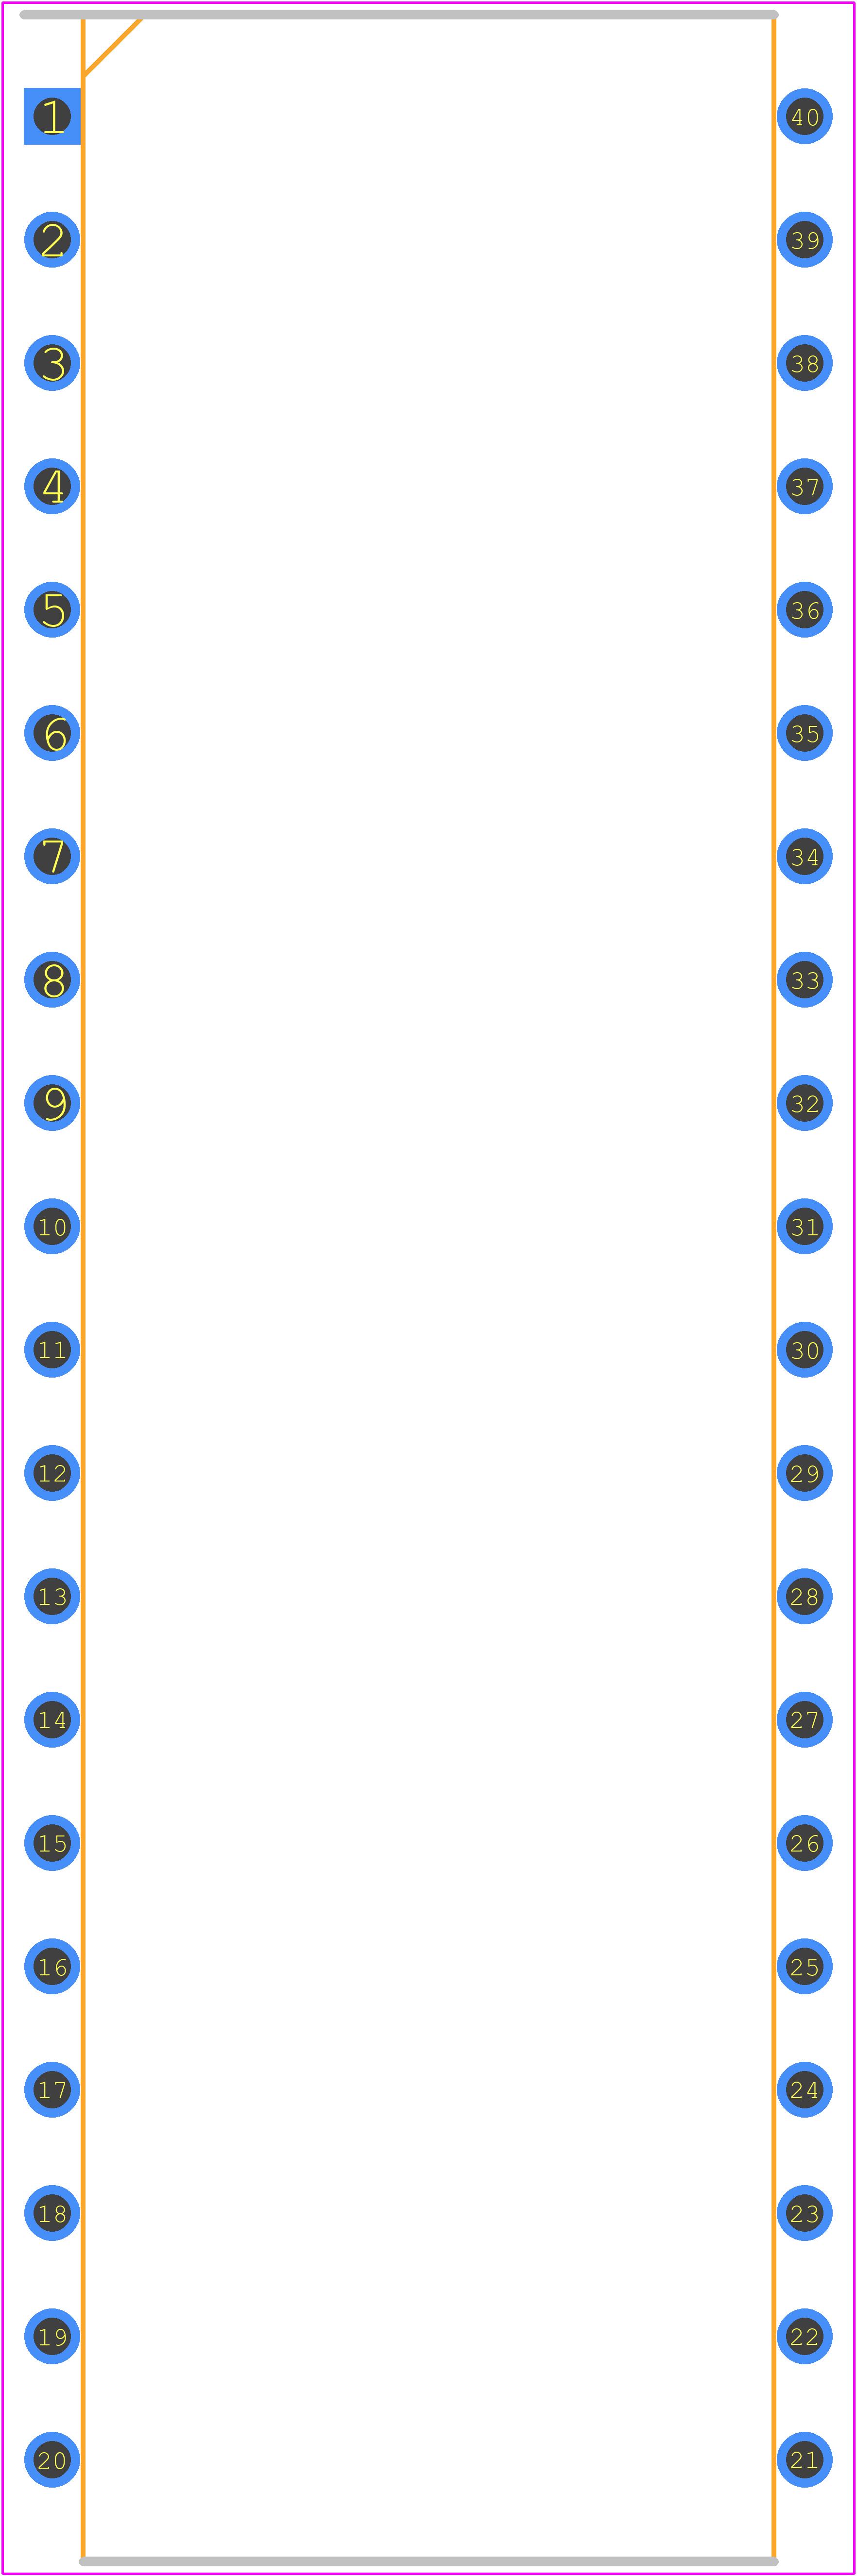 PIC16F877A-I/P - Microchip PCB footprint - Other - DIP254P1524X483-40